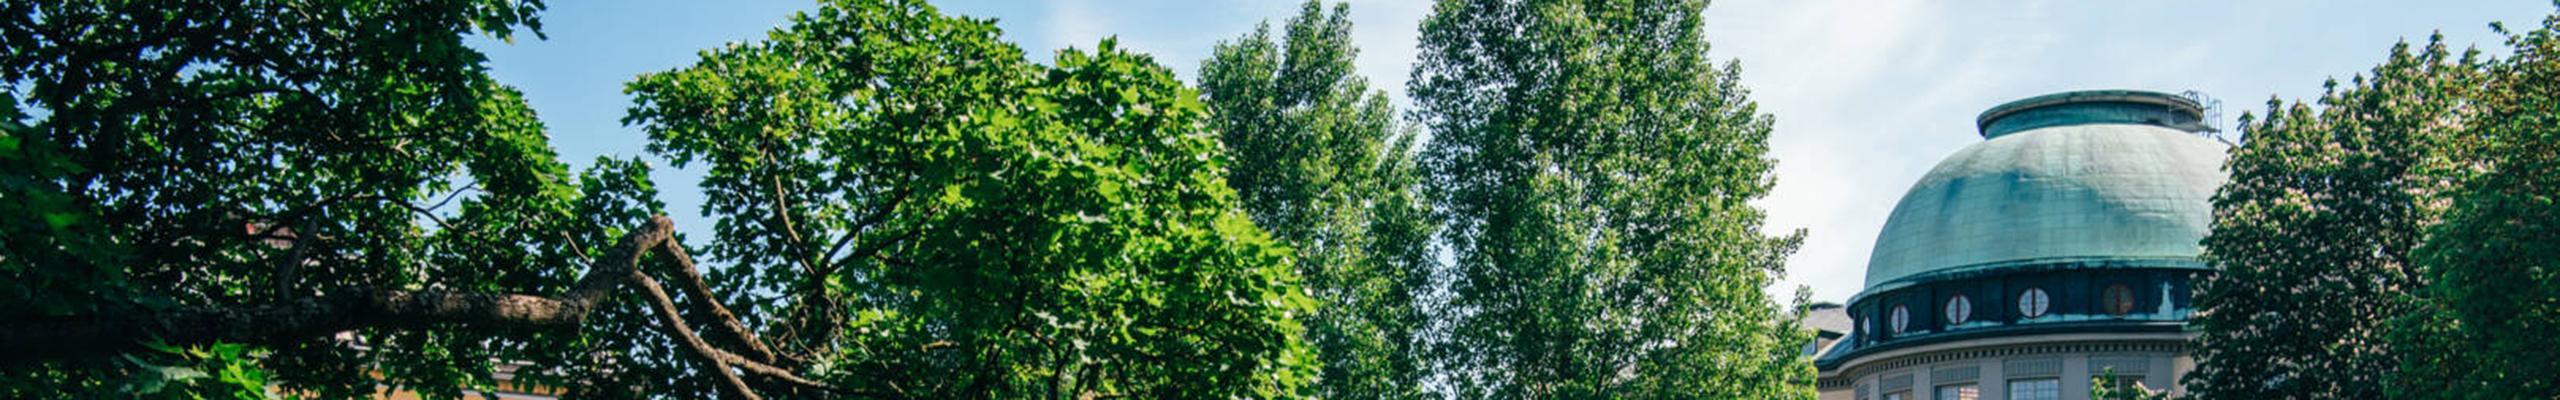 facade_julianawiklund_013_2560x400